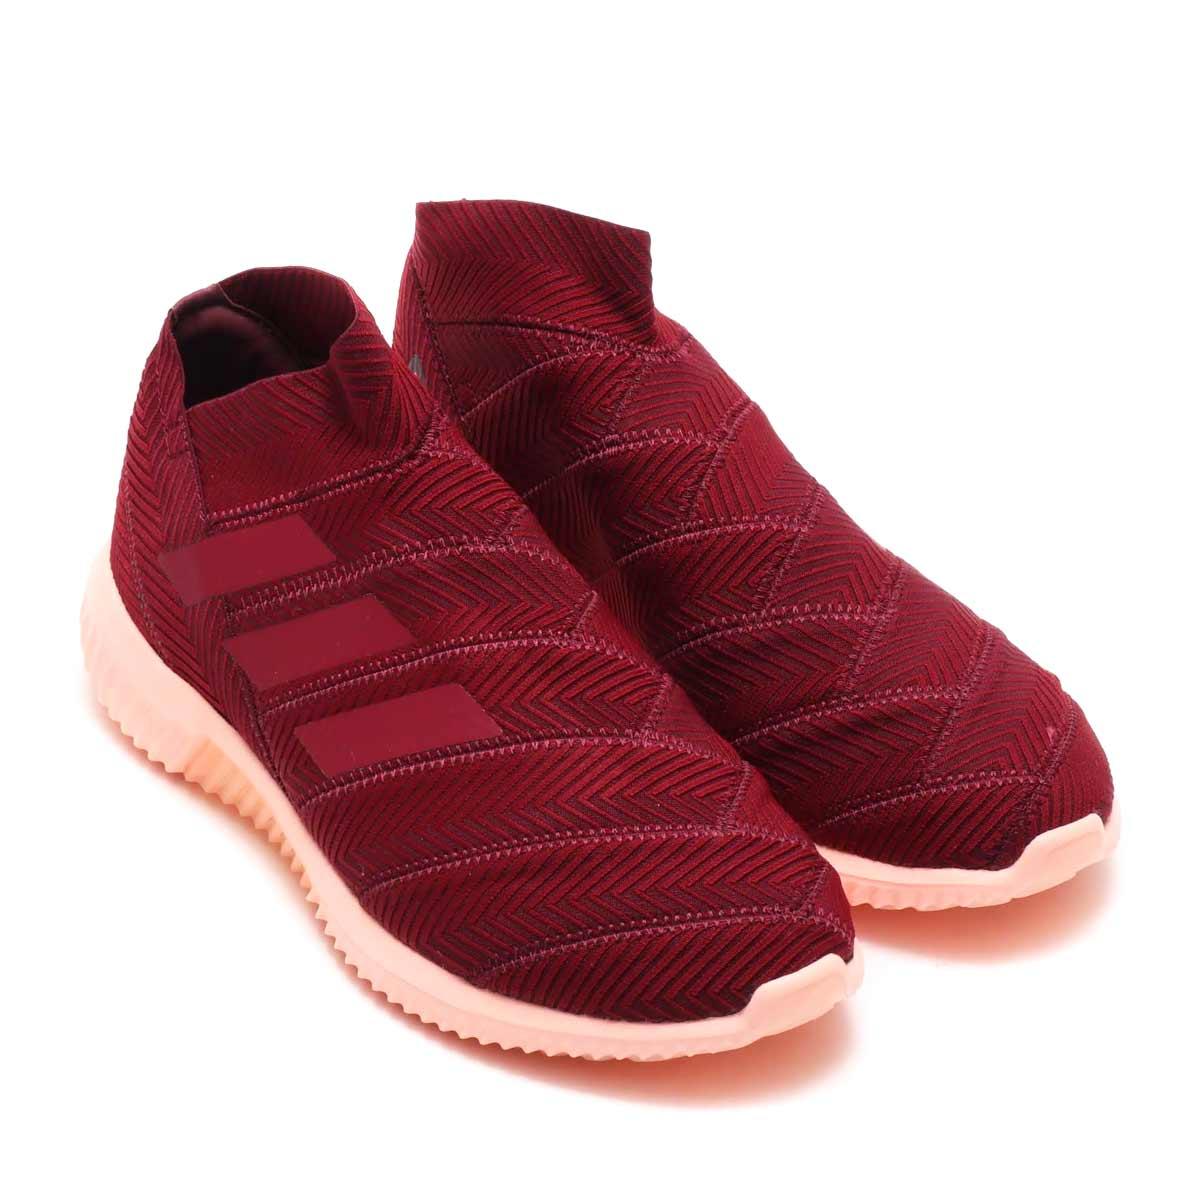 first look outlet on sale top brands adidas NEMEZIZ TANGO 18.1 TR (Adidas Nemesis tango) MAROON/COLLEGEATE  BURGUNDY/CLEAR ORANGE 18FW-S